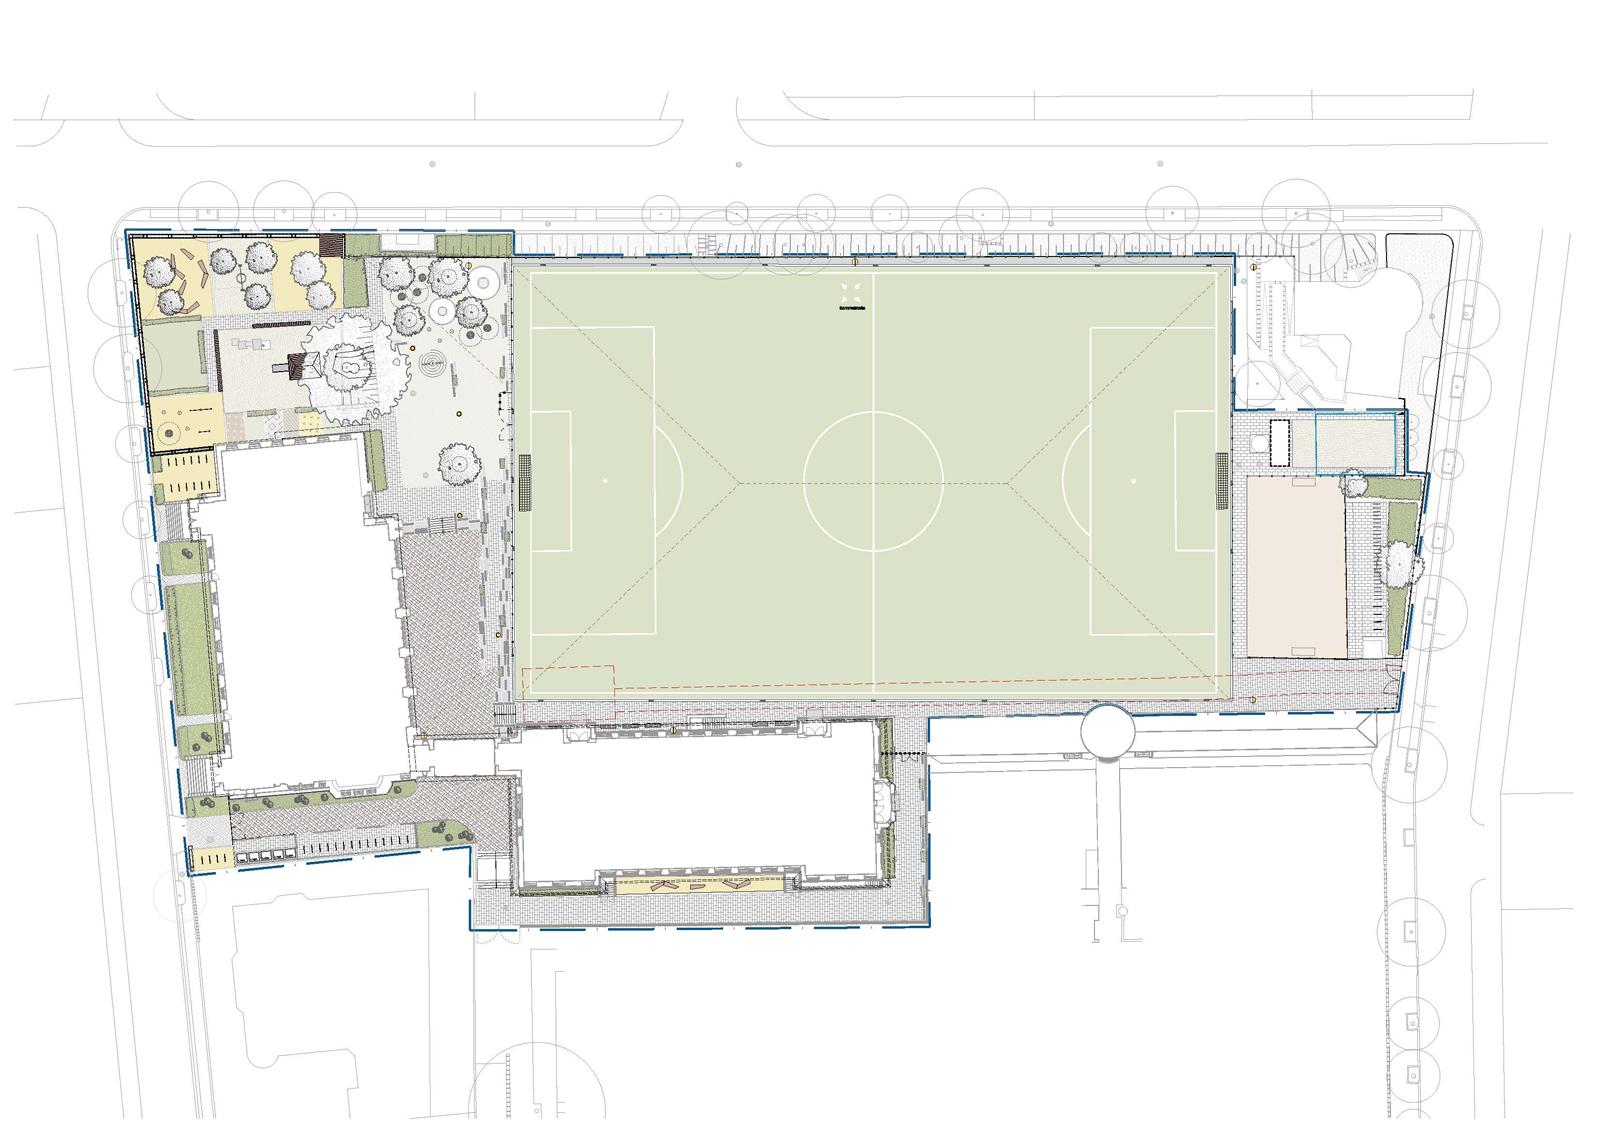 lageplan-ruppin-schule-aussenanlagen-grundschule-neuplanung-berlin-landschaftsarchitektur-albert-armbruster